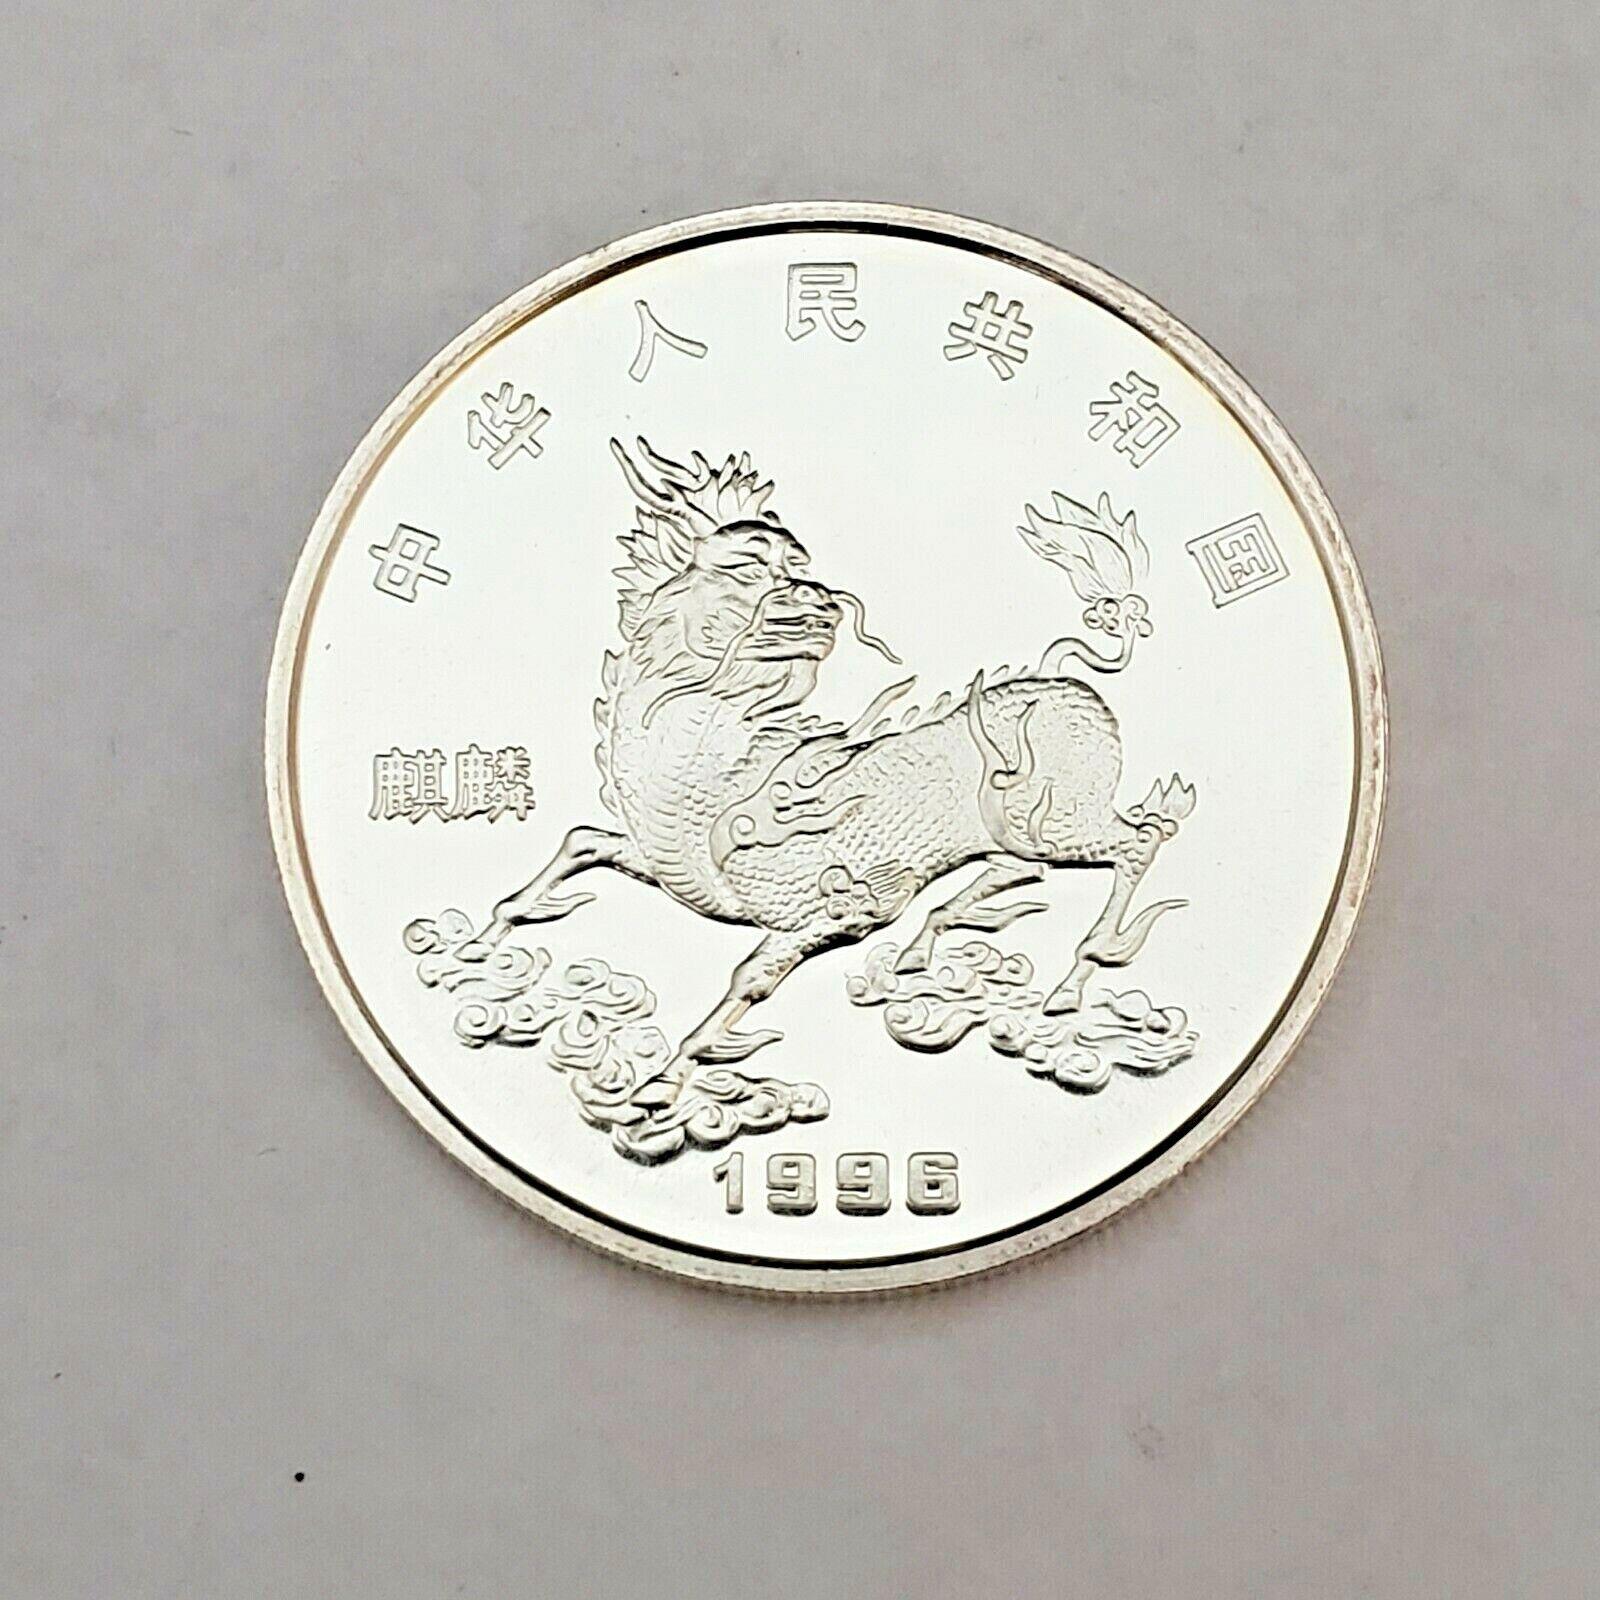 1996 Chinese 5 Yuan Unicorn Silver Coin China #1